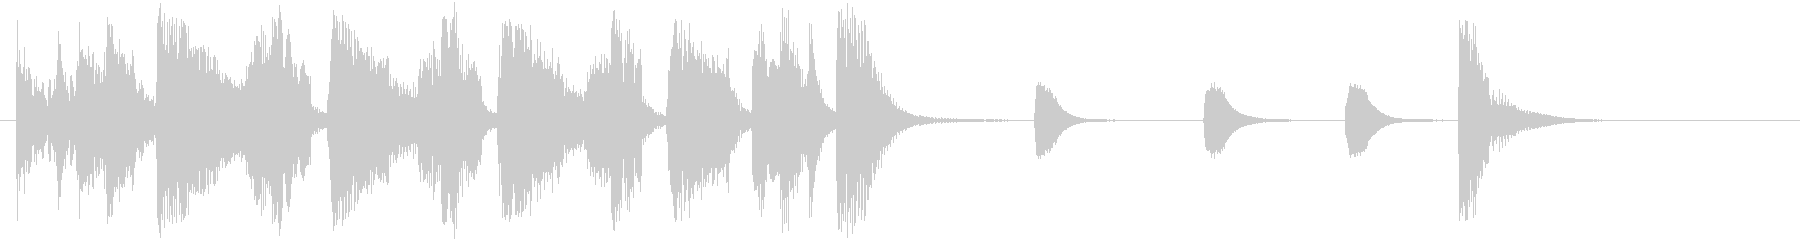 JAZZ風の軽快なジングル2の未再生の波形